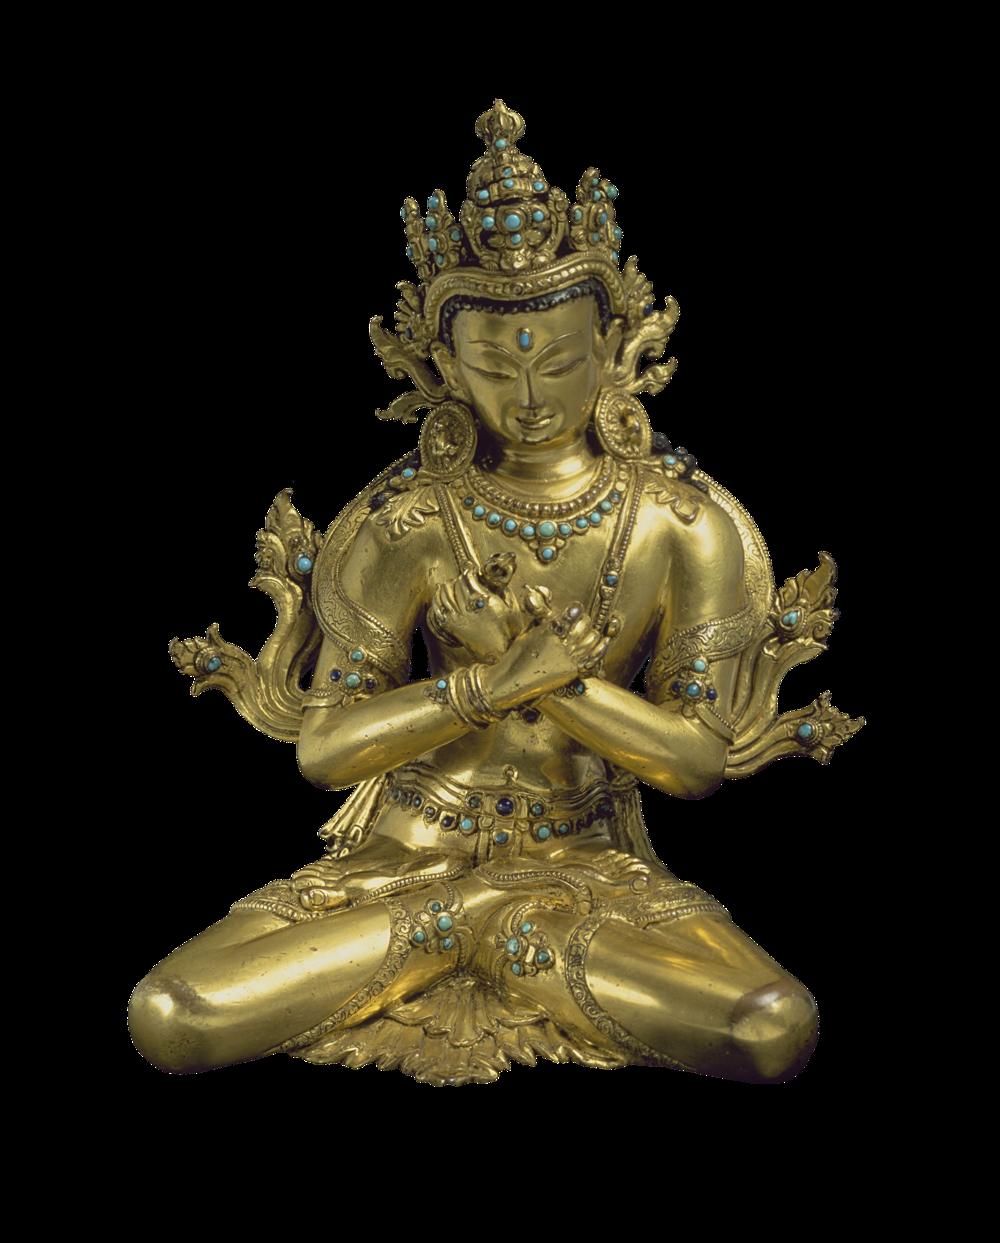 Der Ur-Buddha Vajradhara